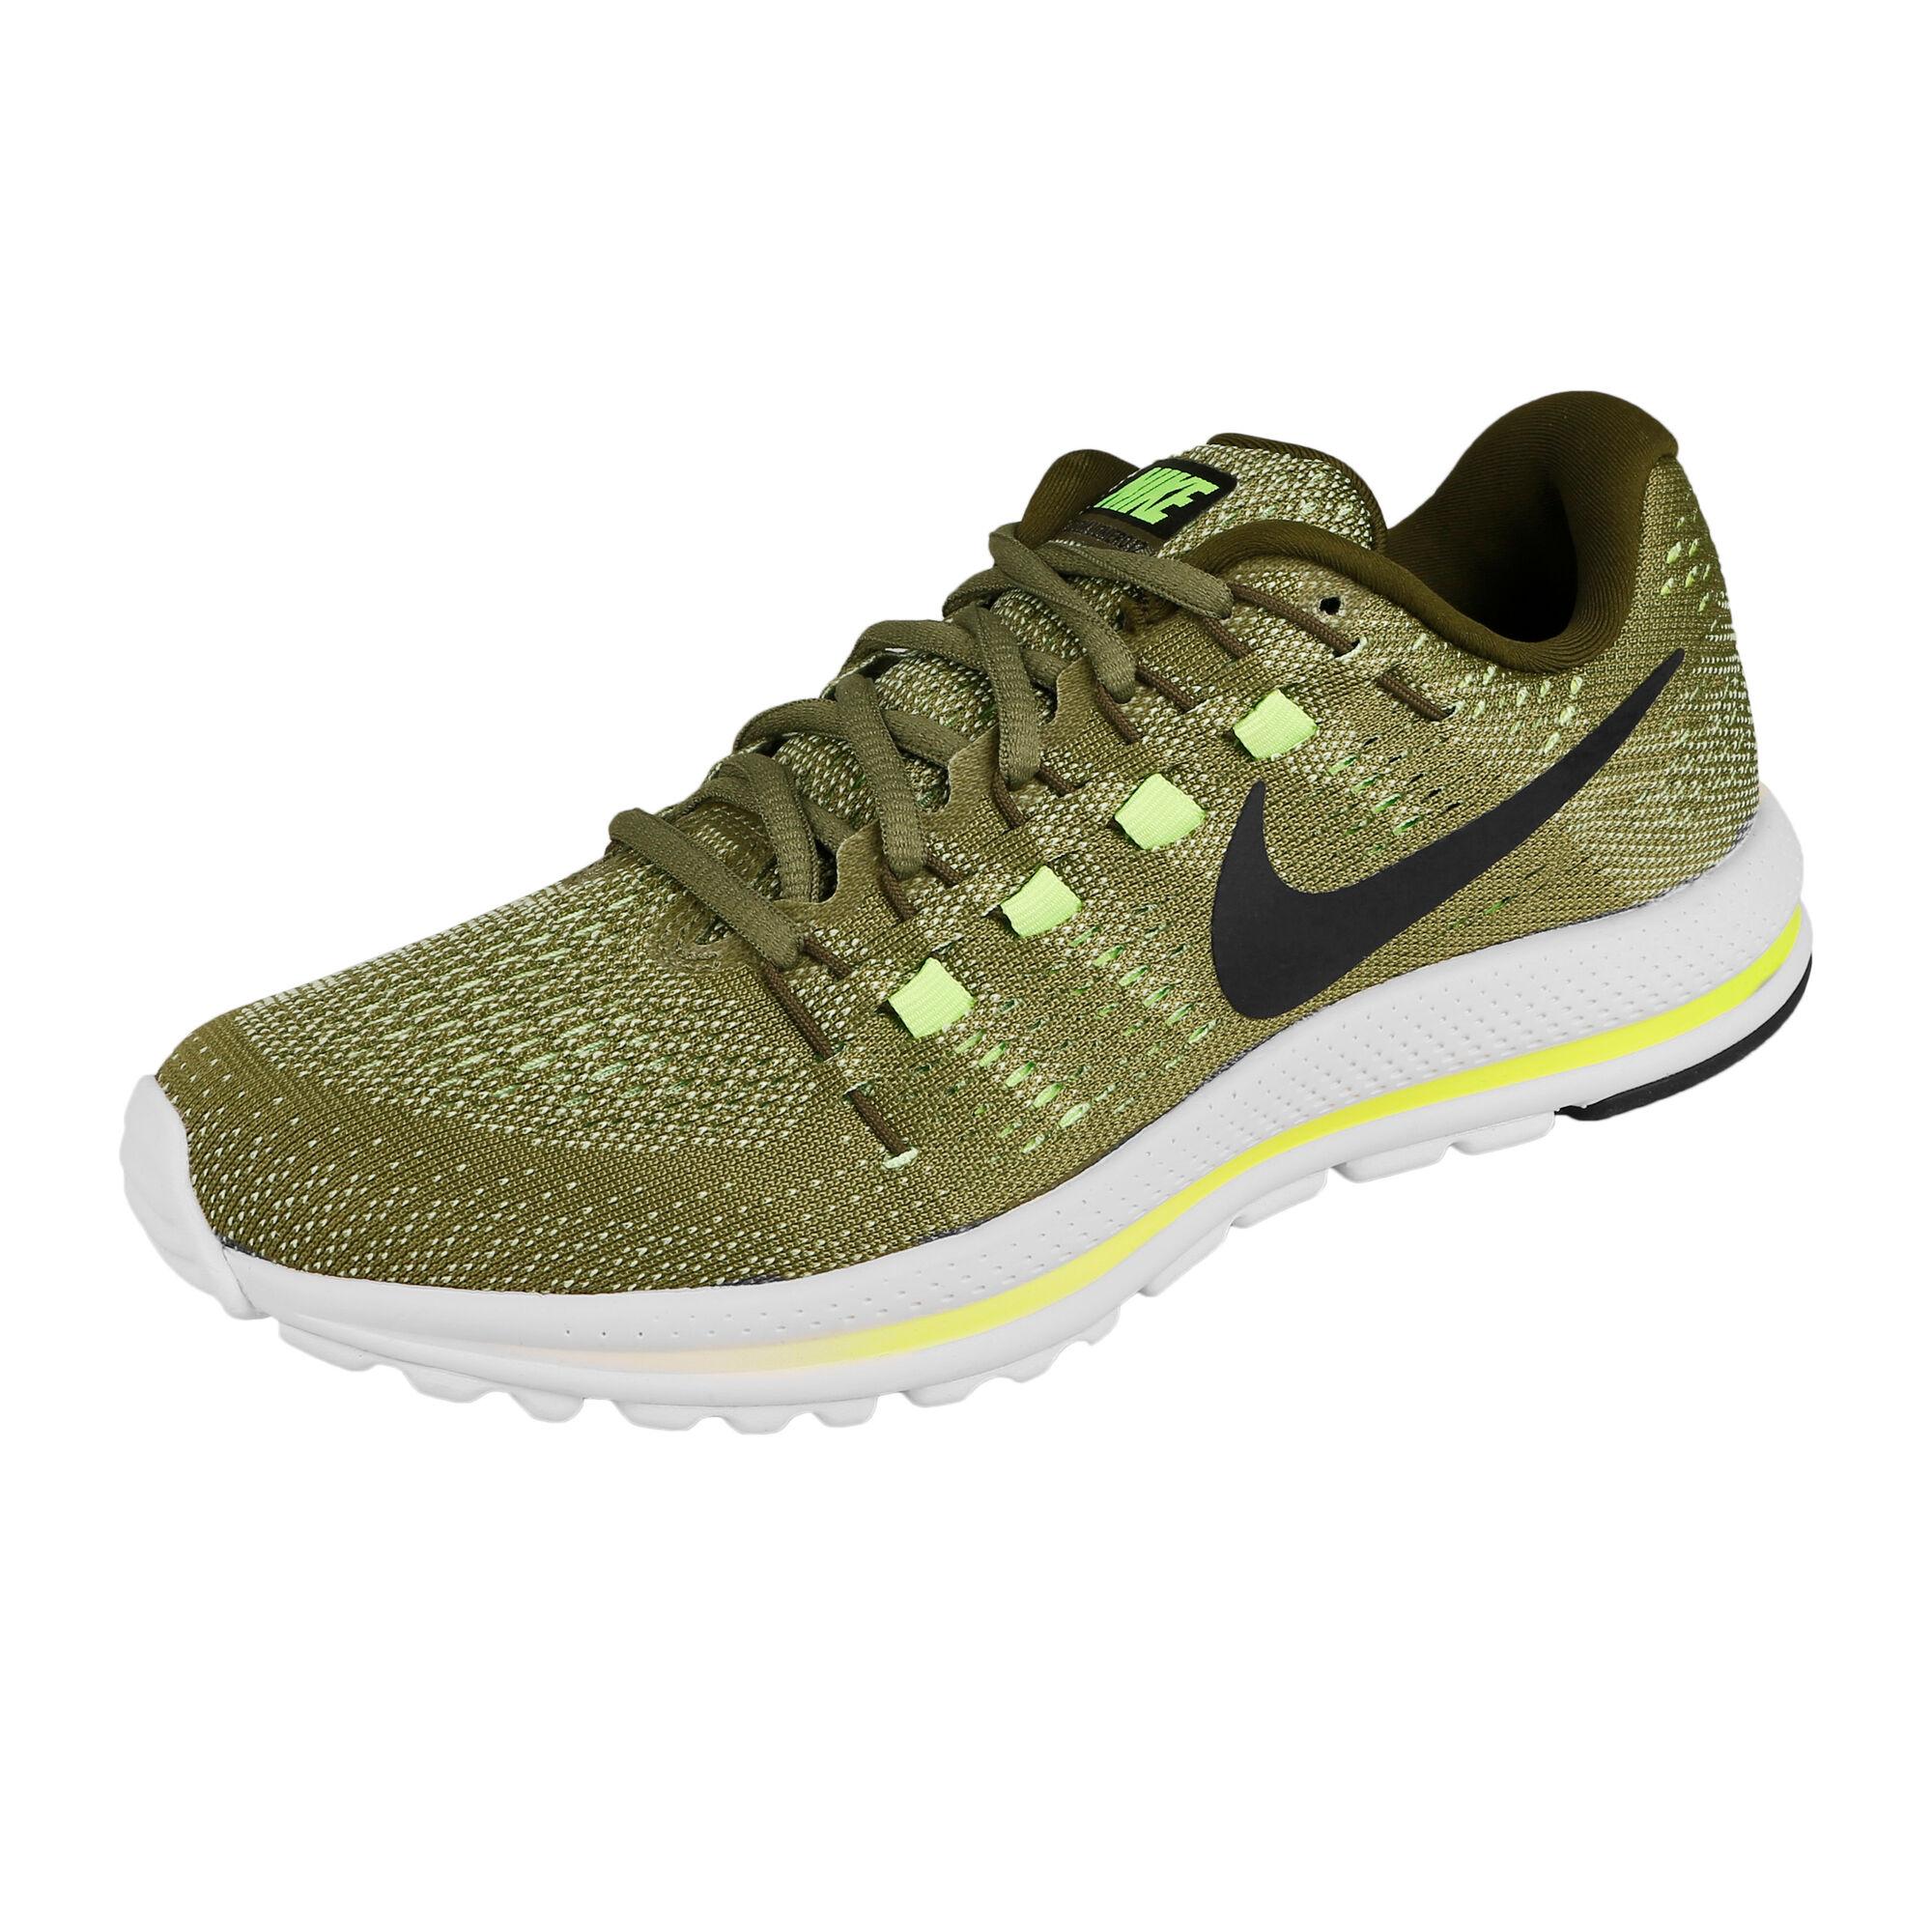 281dcb1852fbb Nike  Nike  Nike  Nike  Nike  Nike  Nike  Nike  Nike  Nike. Air Zoom Vomero  12 Women ...